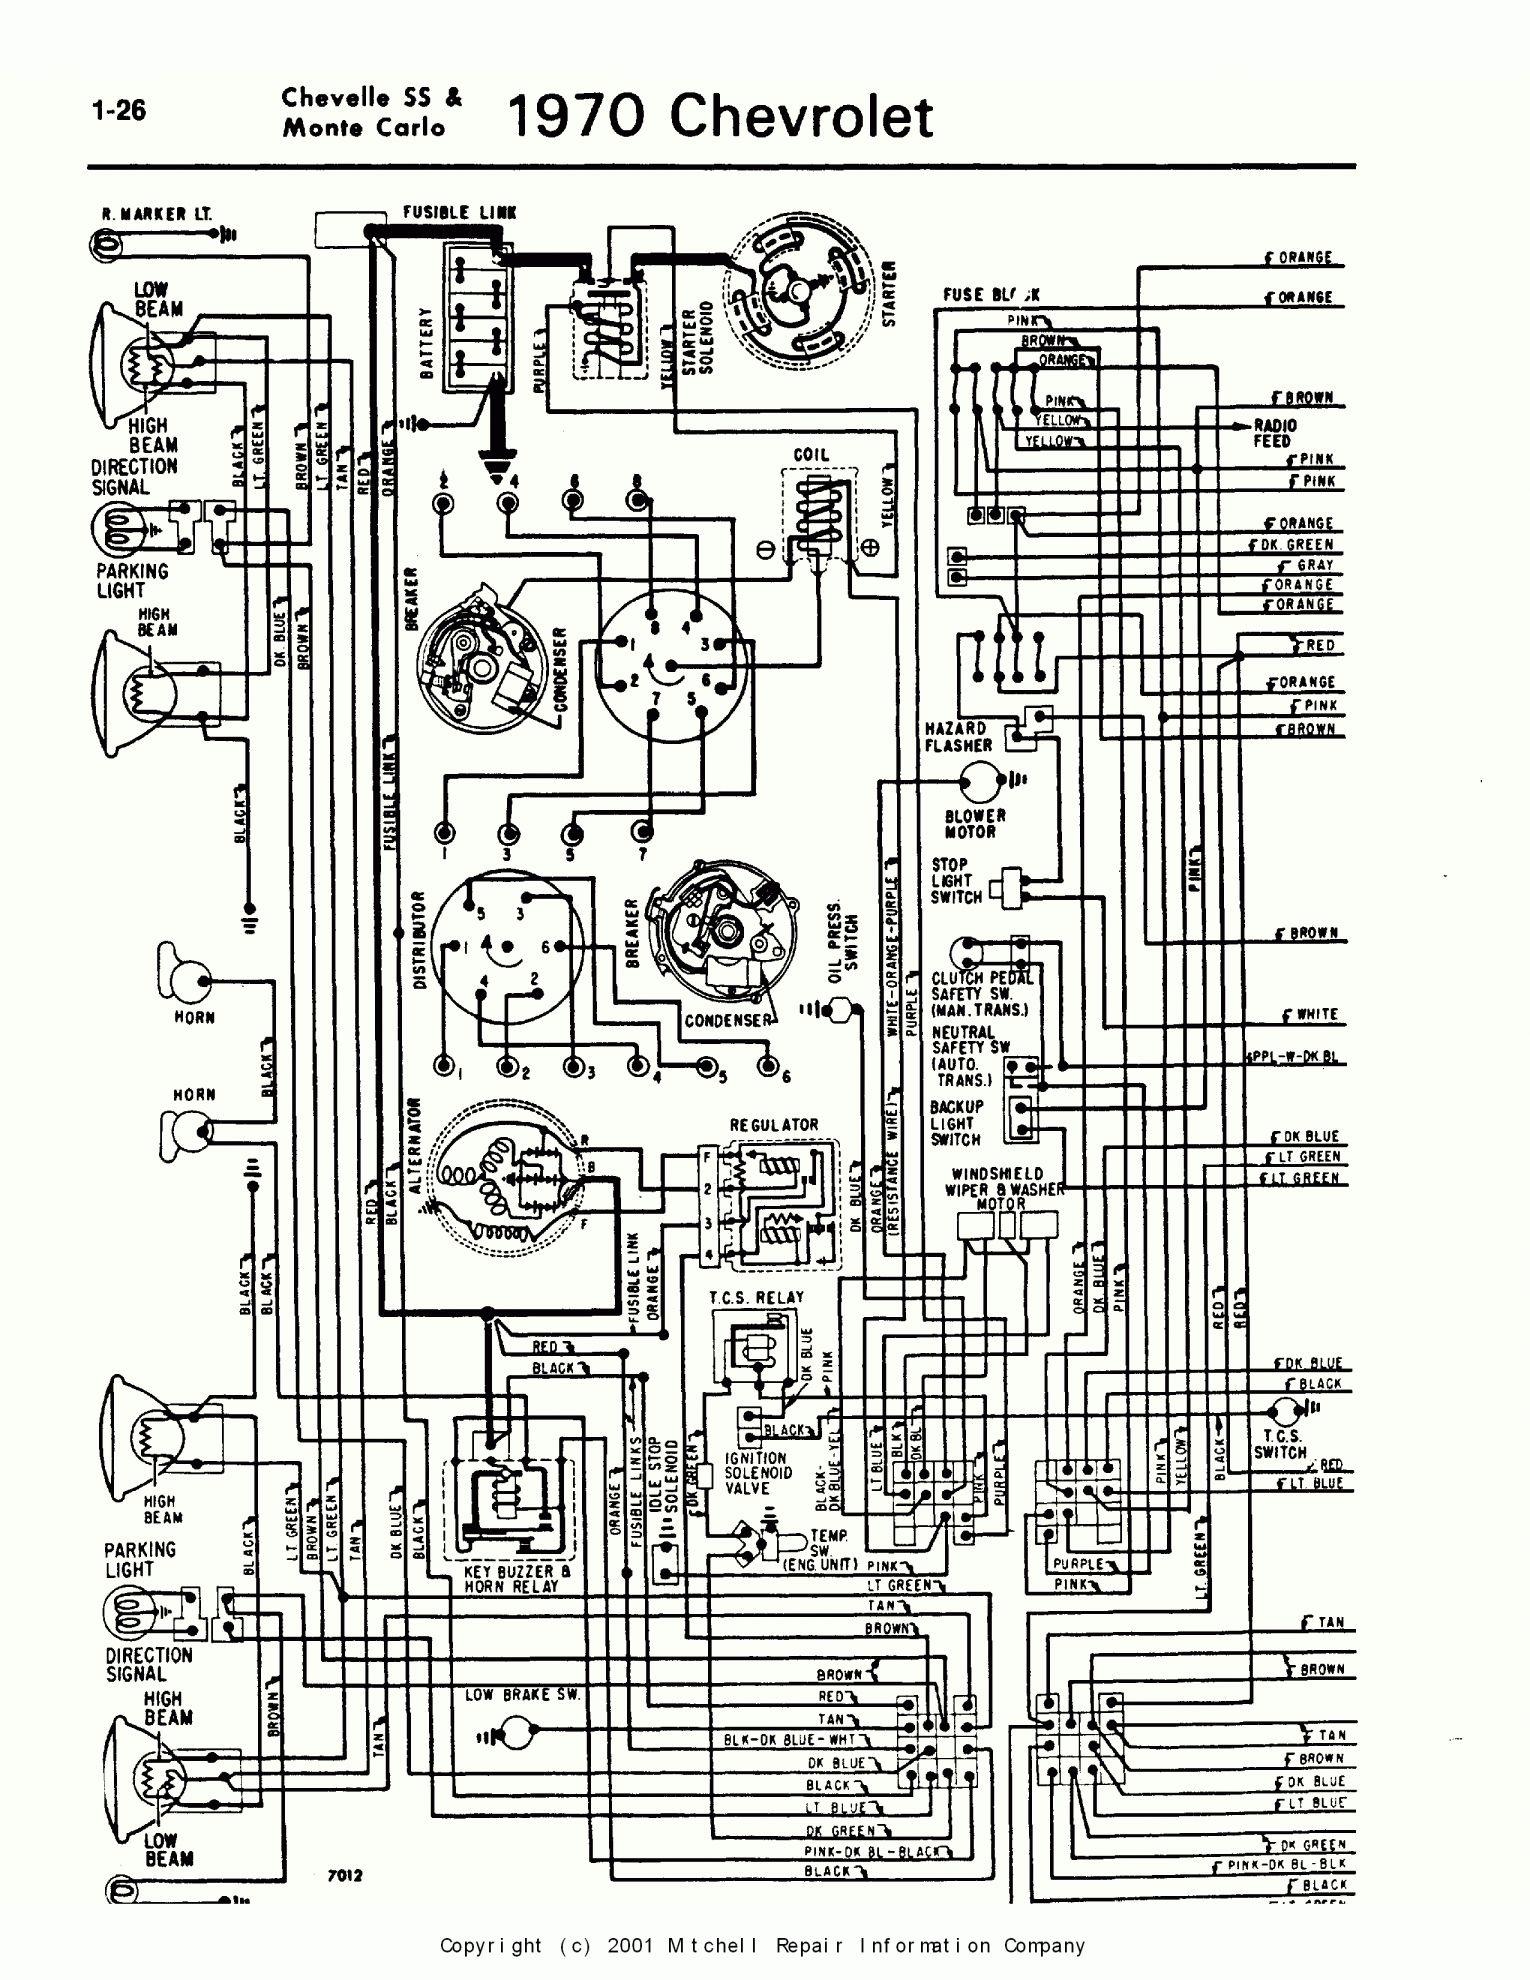 18 1967 Chevelle Engine Wiring Diagram 1970 Chevelle Chevelle 1967 Chevelle